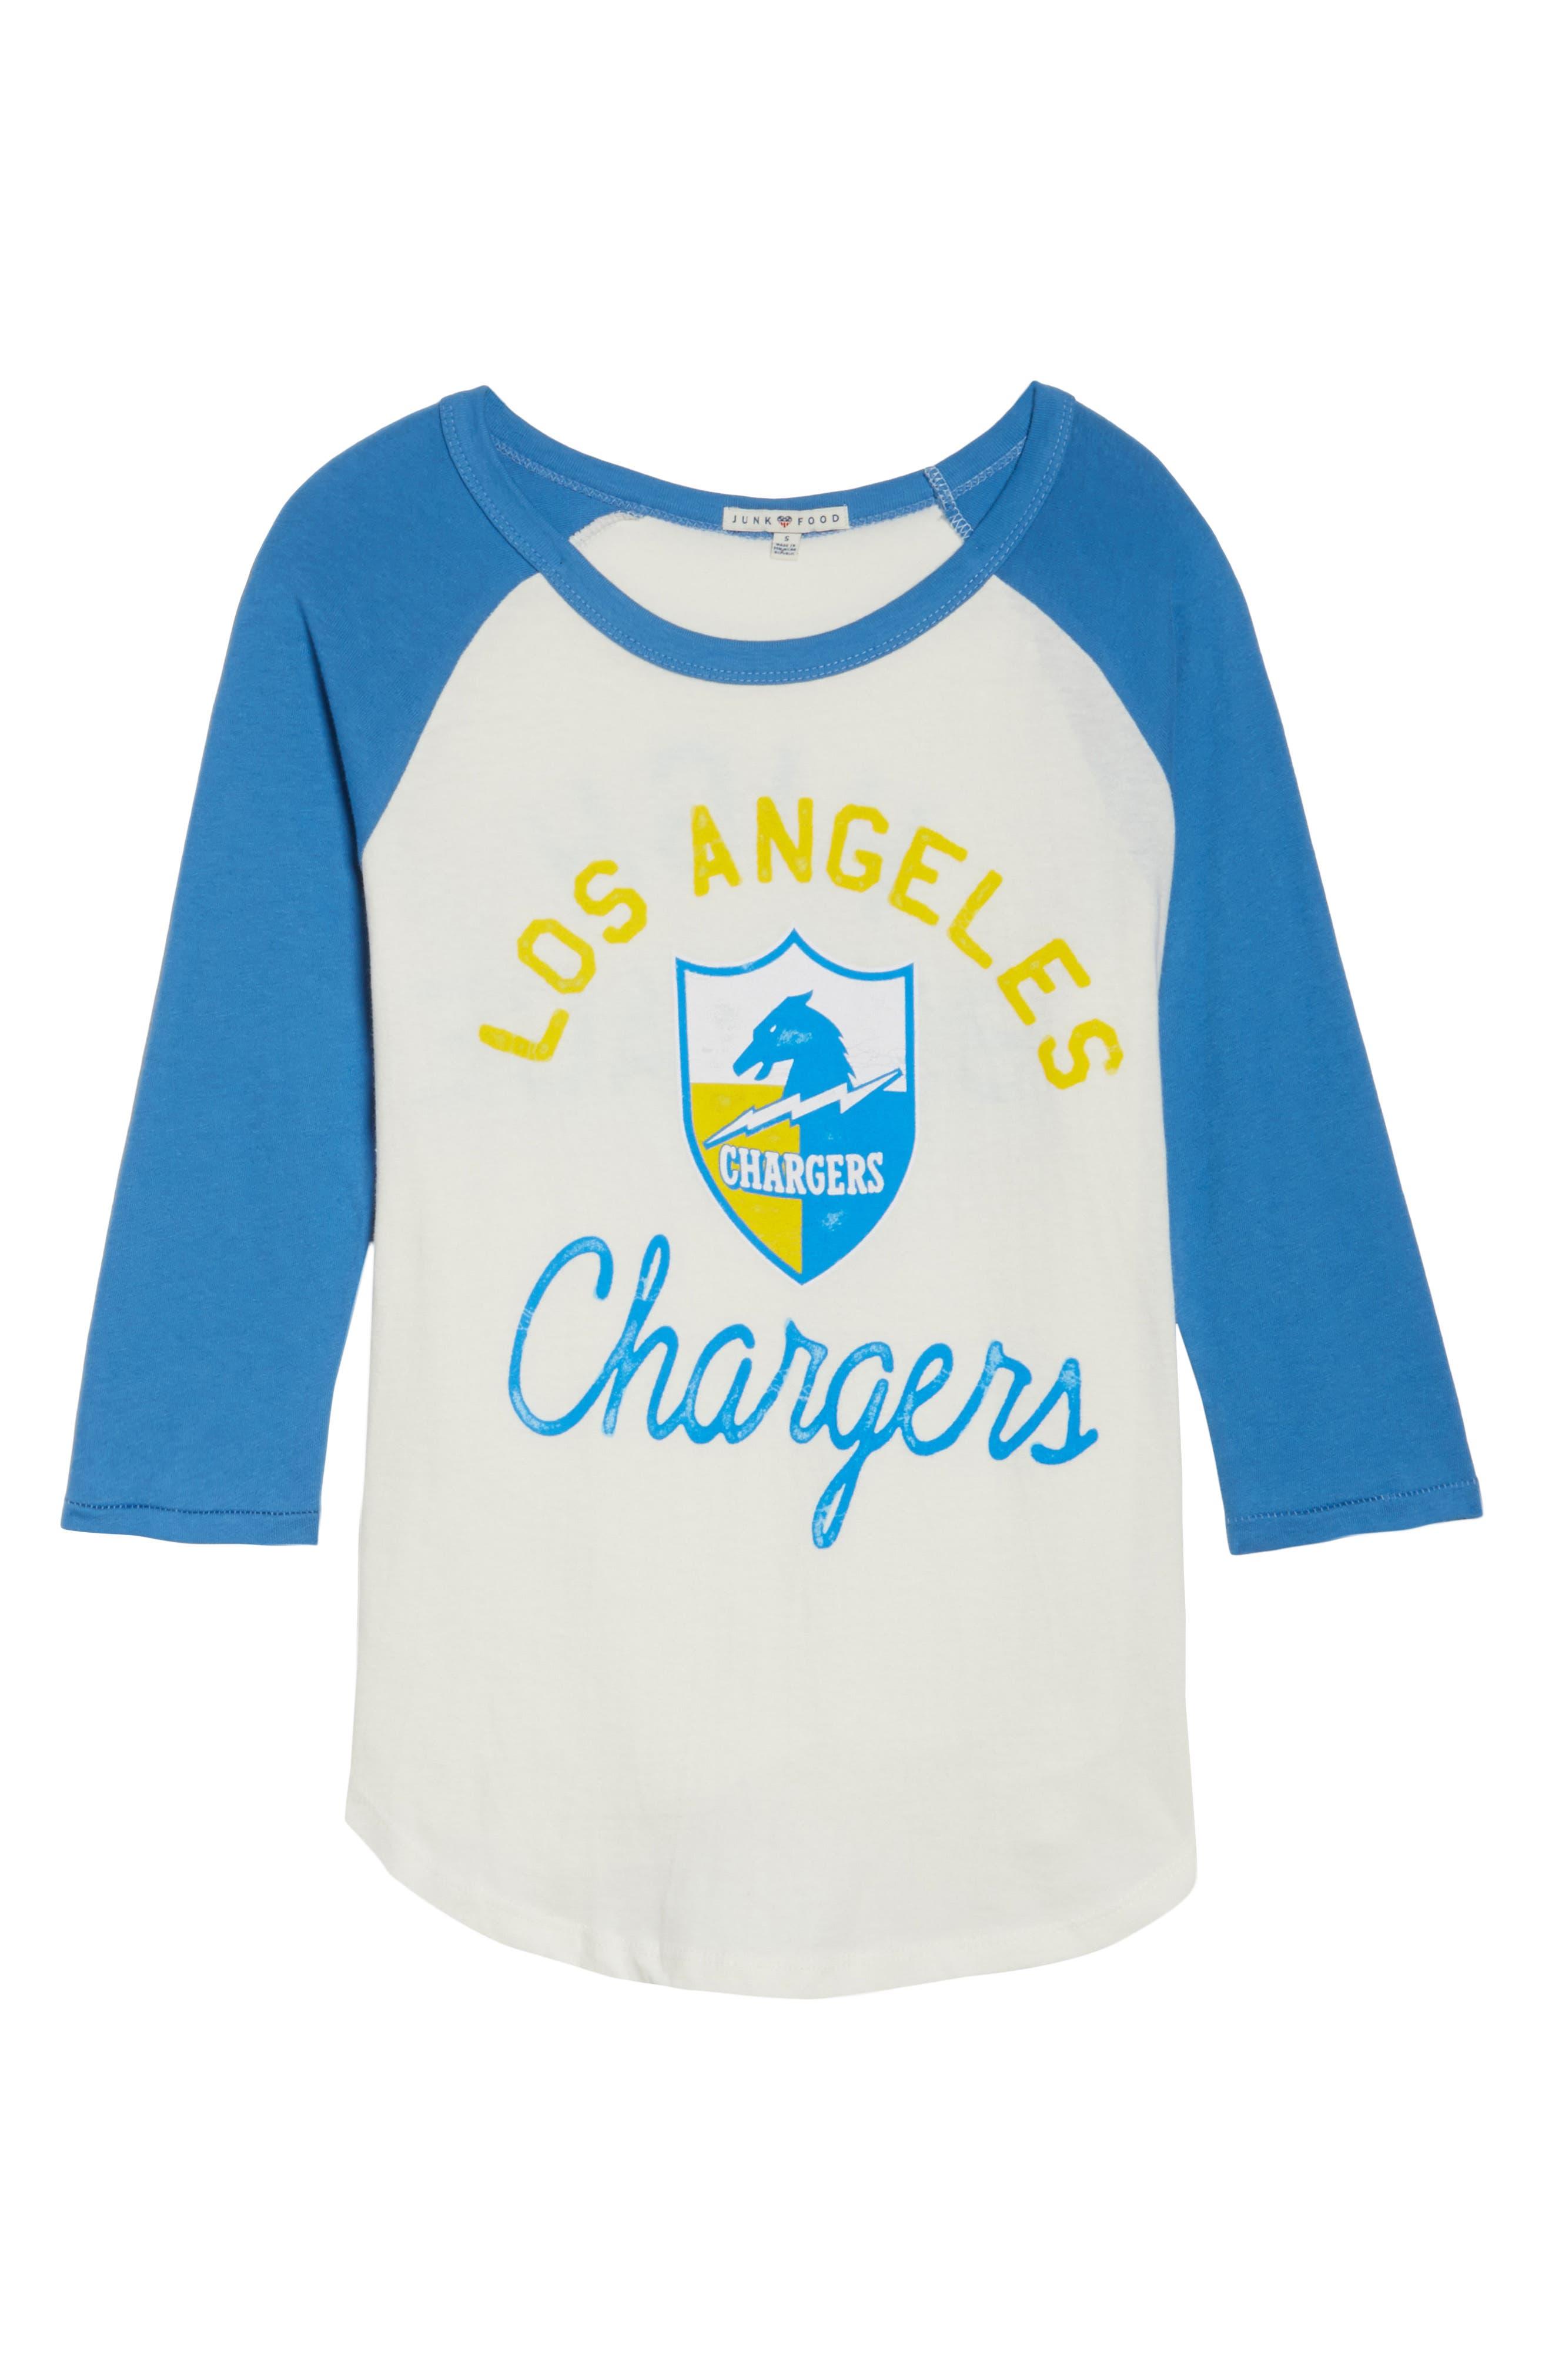 NFL Los Angeles Chargers Raglan Tee,                             Alternate thumbnail 6, color,                             189